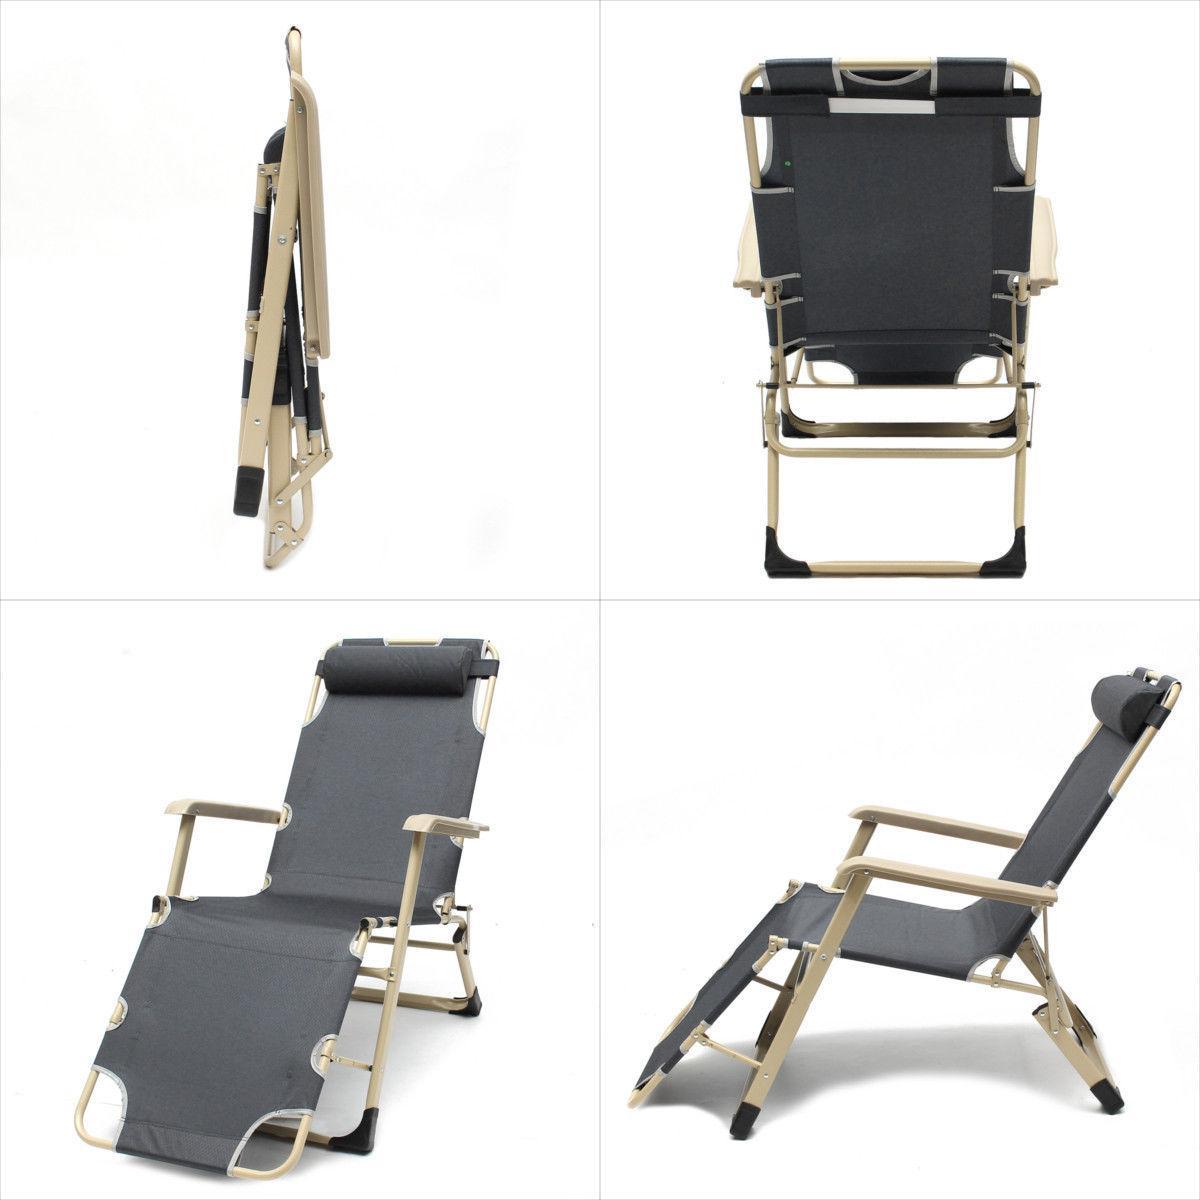 Cotton Cushion Foldable Chair/Beach Chair ☆ Outdoor/Lying Bed/Reclining Chair